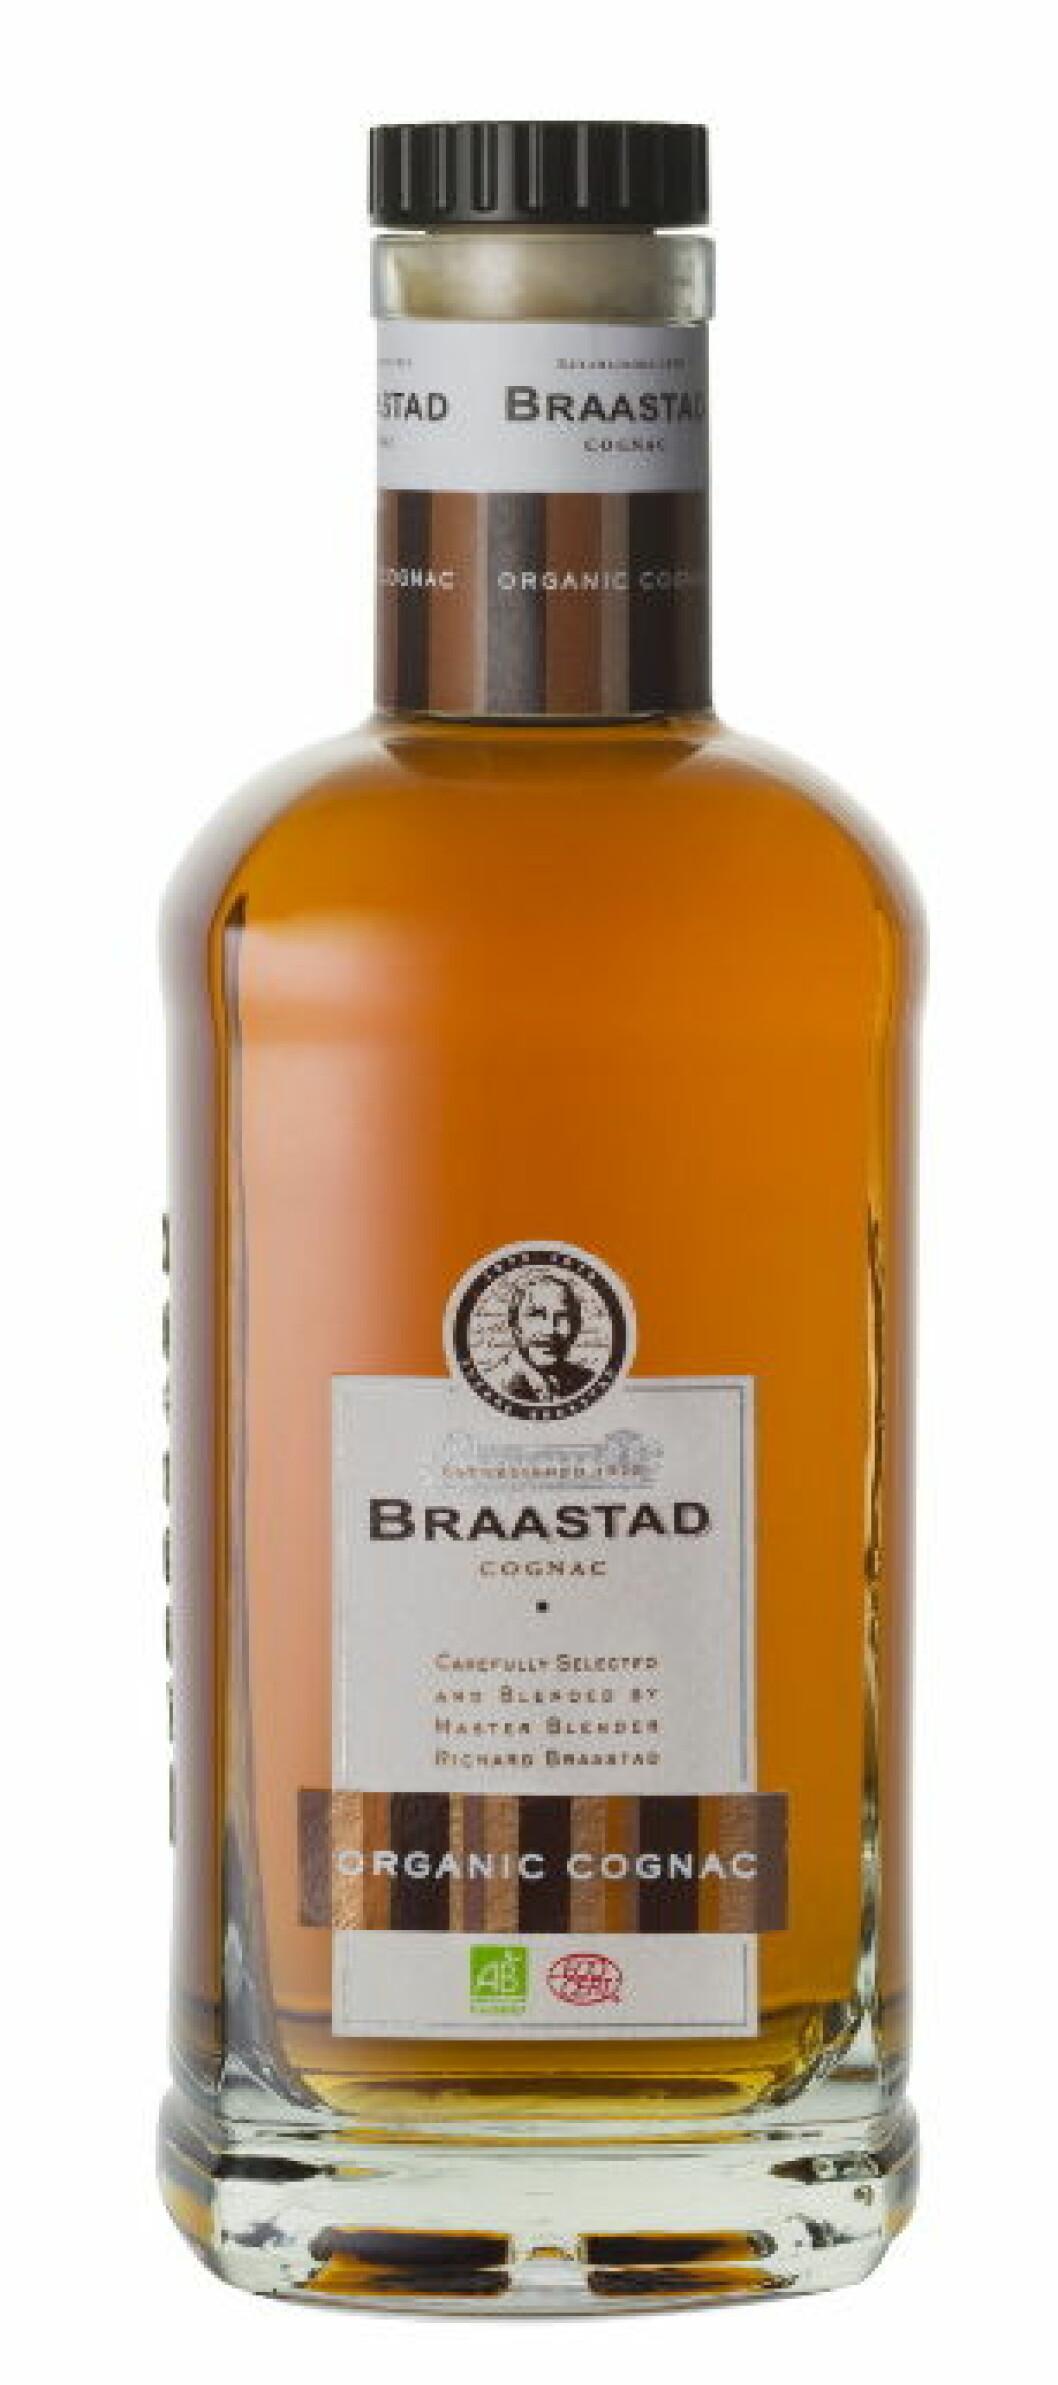 Braastad Cognac Organic